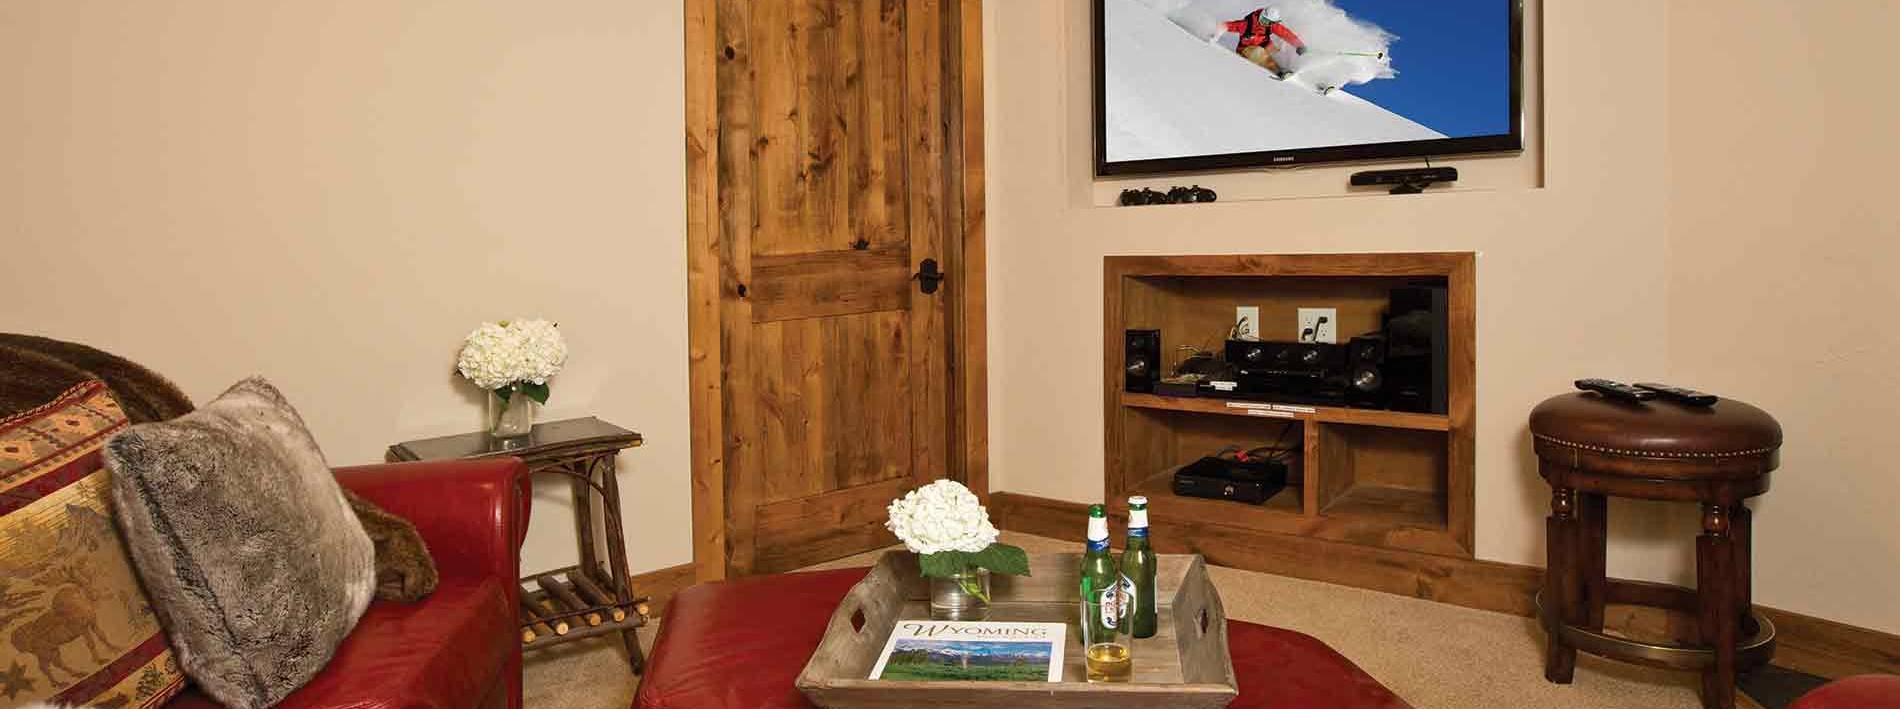 Spacious TV room in the 6 bedroom Blue Moose Lodge